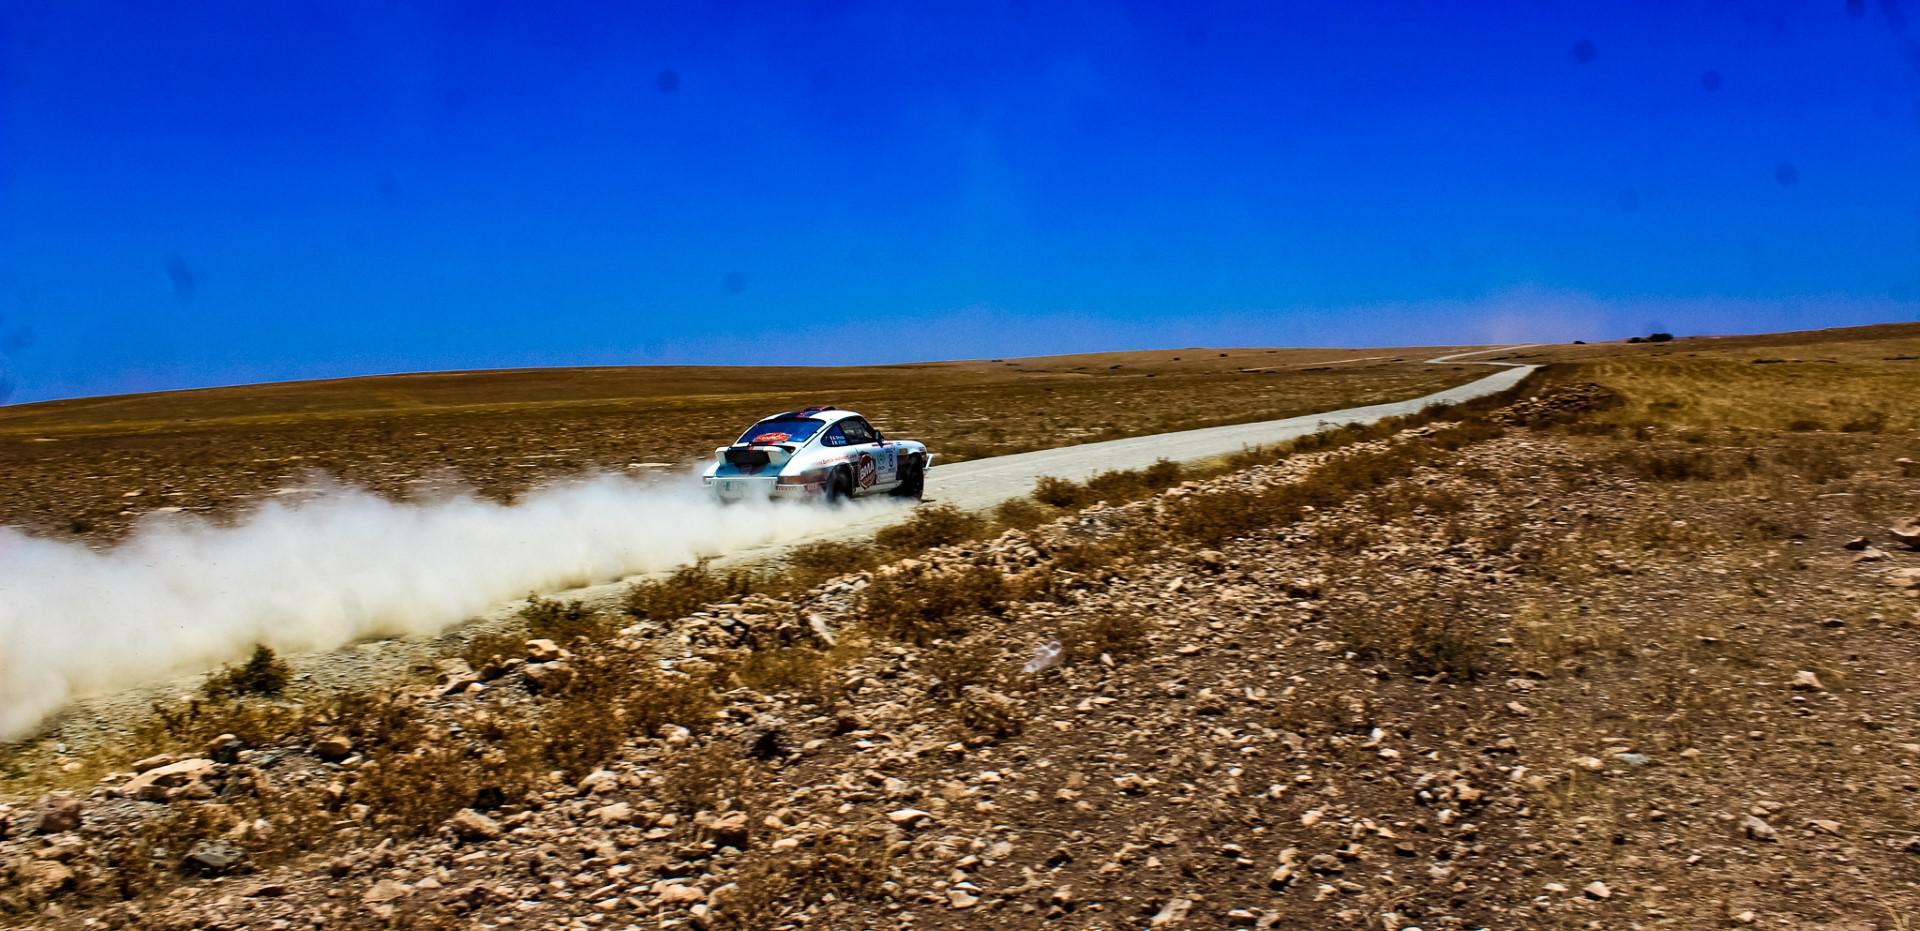 maroc-historic-rally-mhr-2018-changement-de-leader-a-1-jour-de-la-fin-826-1.jpg